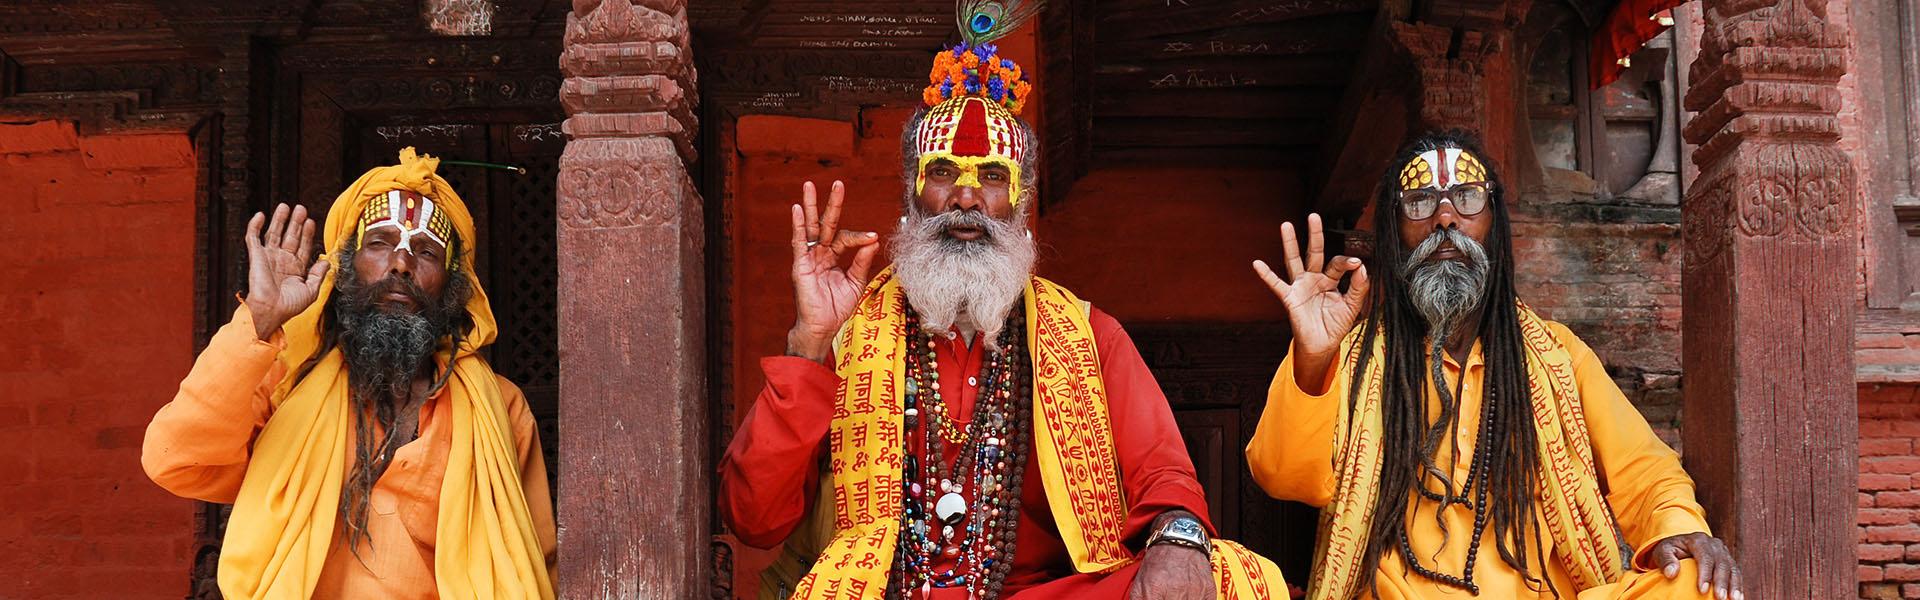 Nepal Tibet Tours & Lhasa Kathmandu Tours